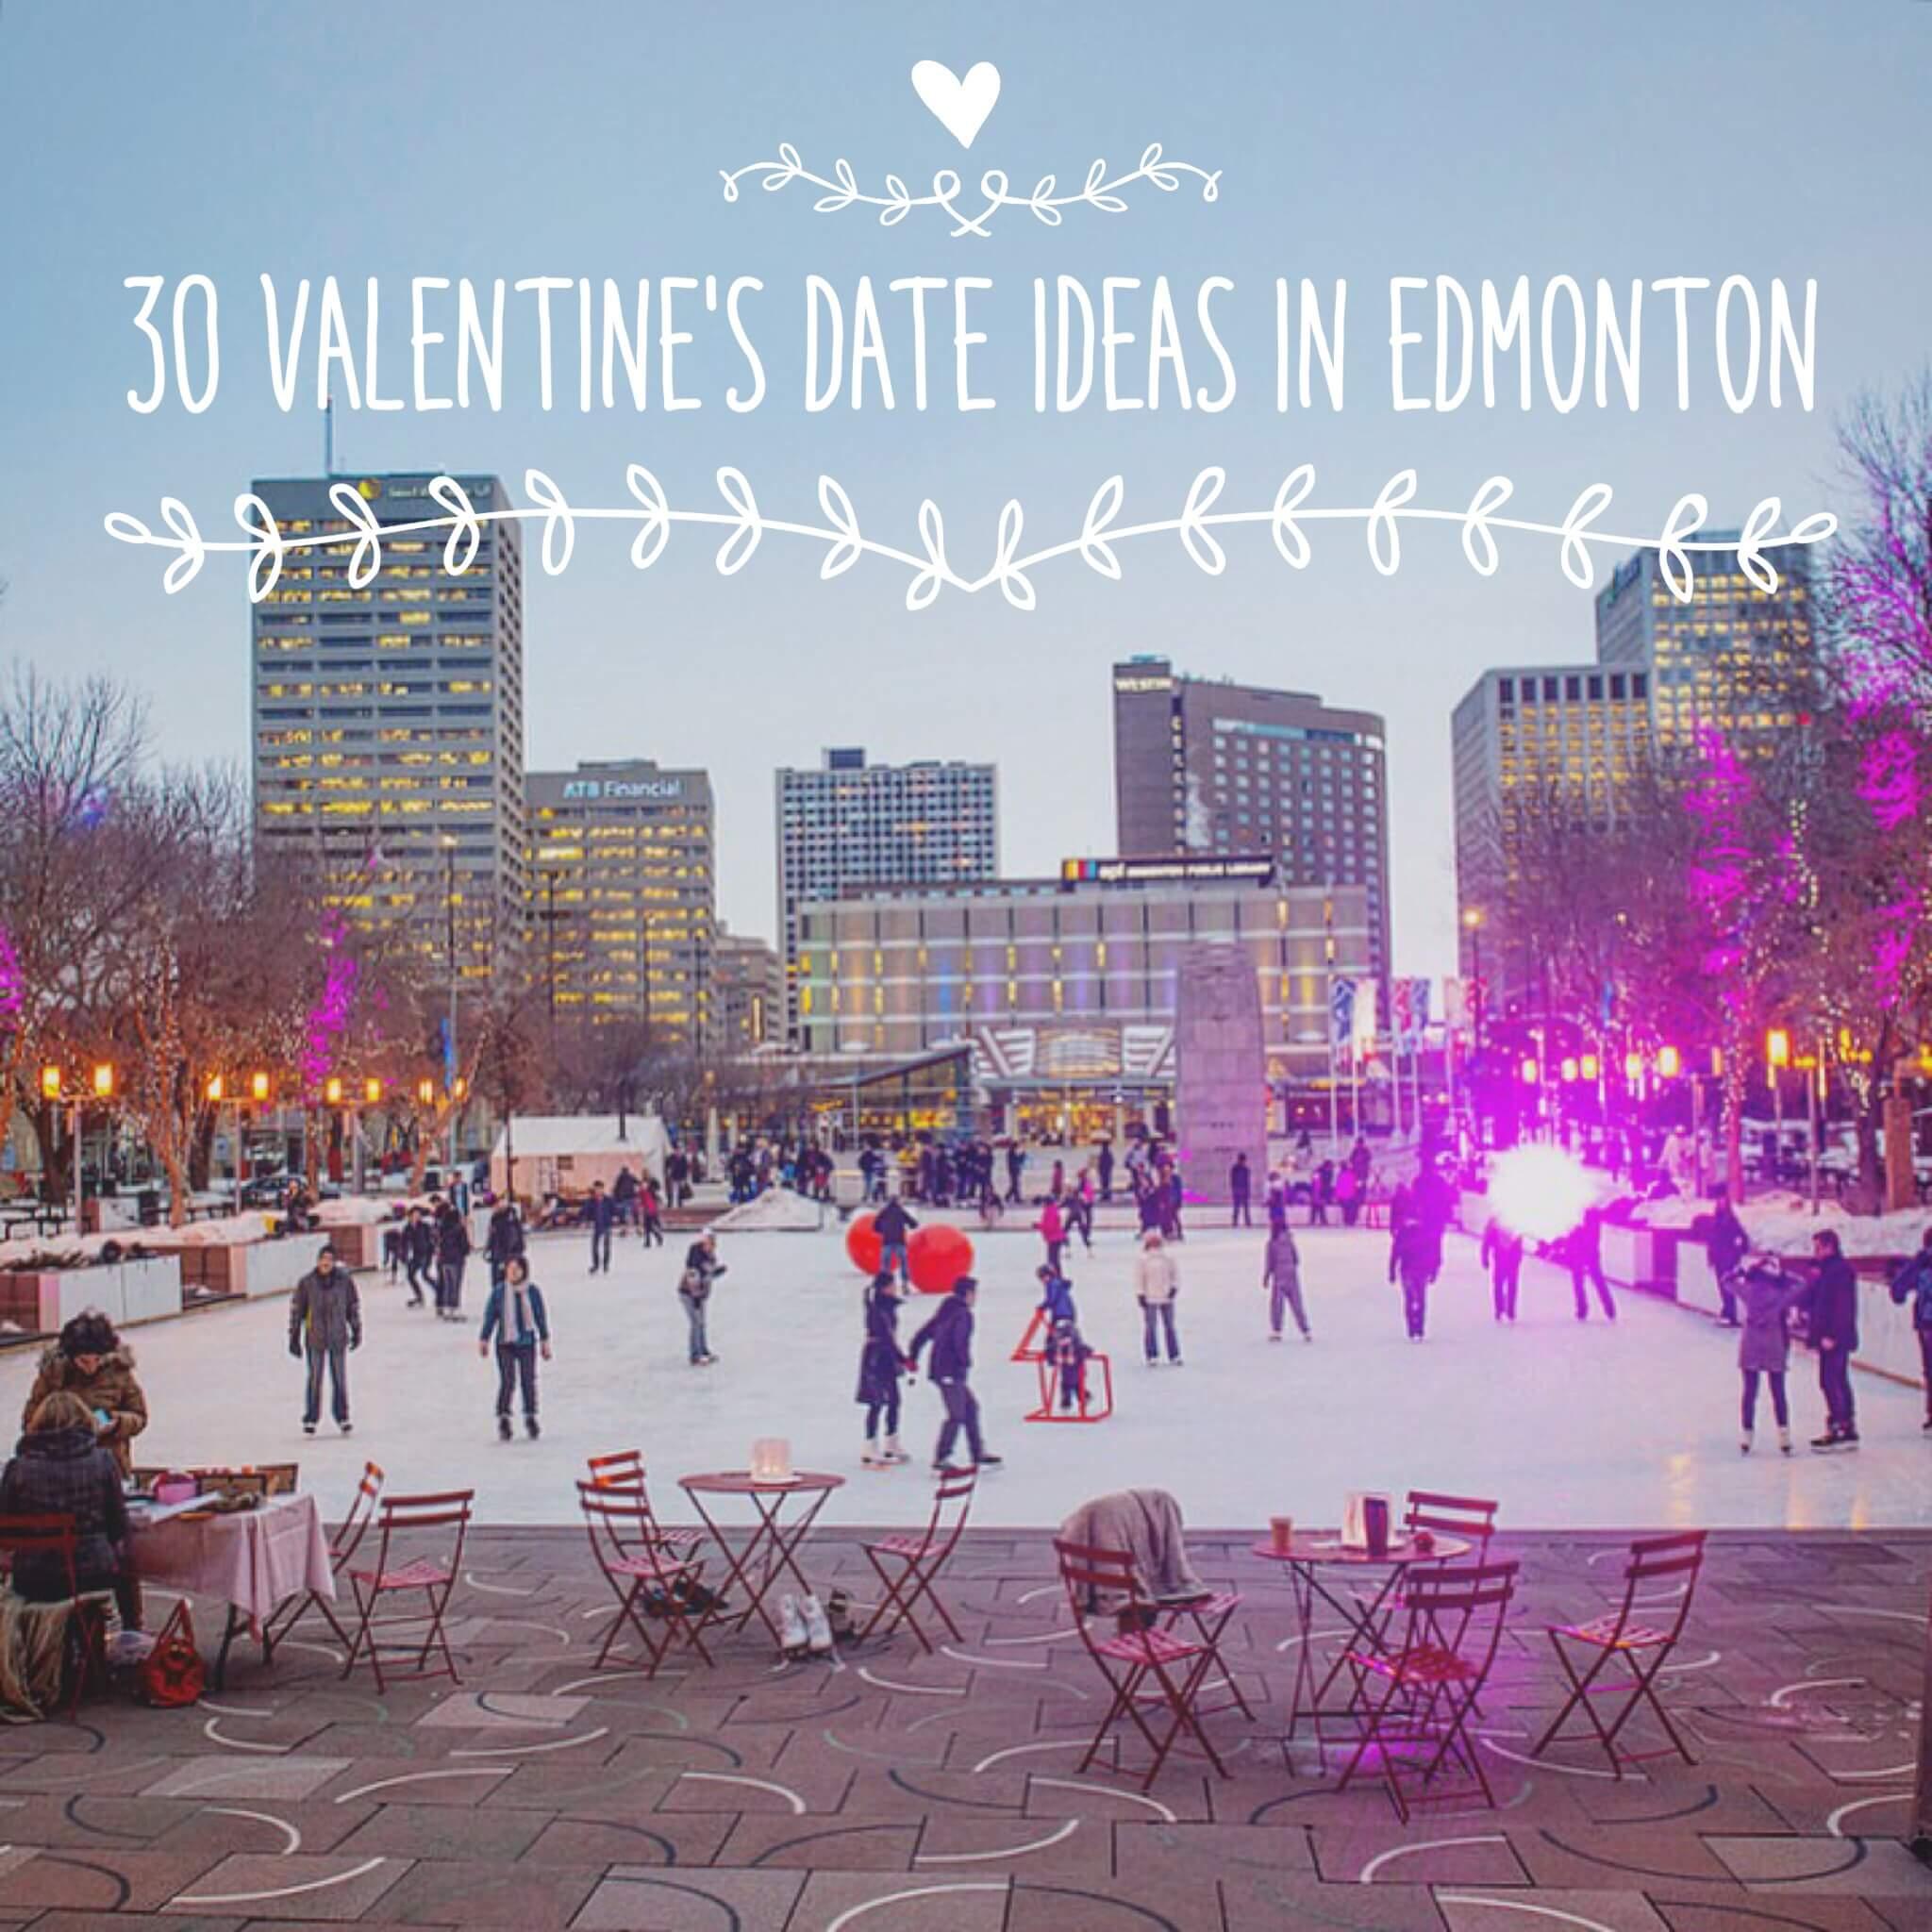 30 Valentines Date Ideas In Edmonton 2016 LINDA HOANG